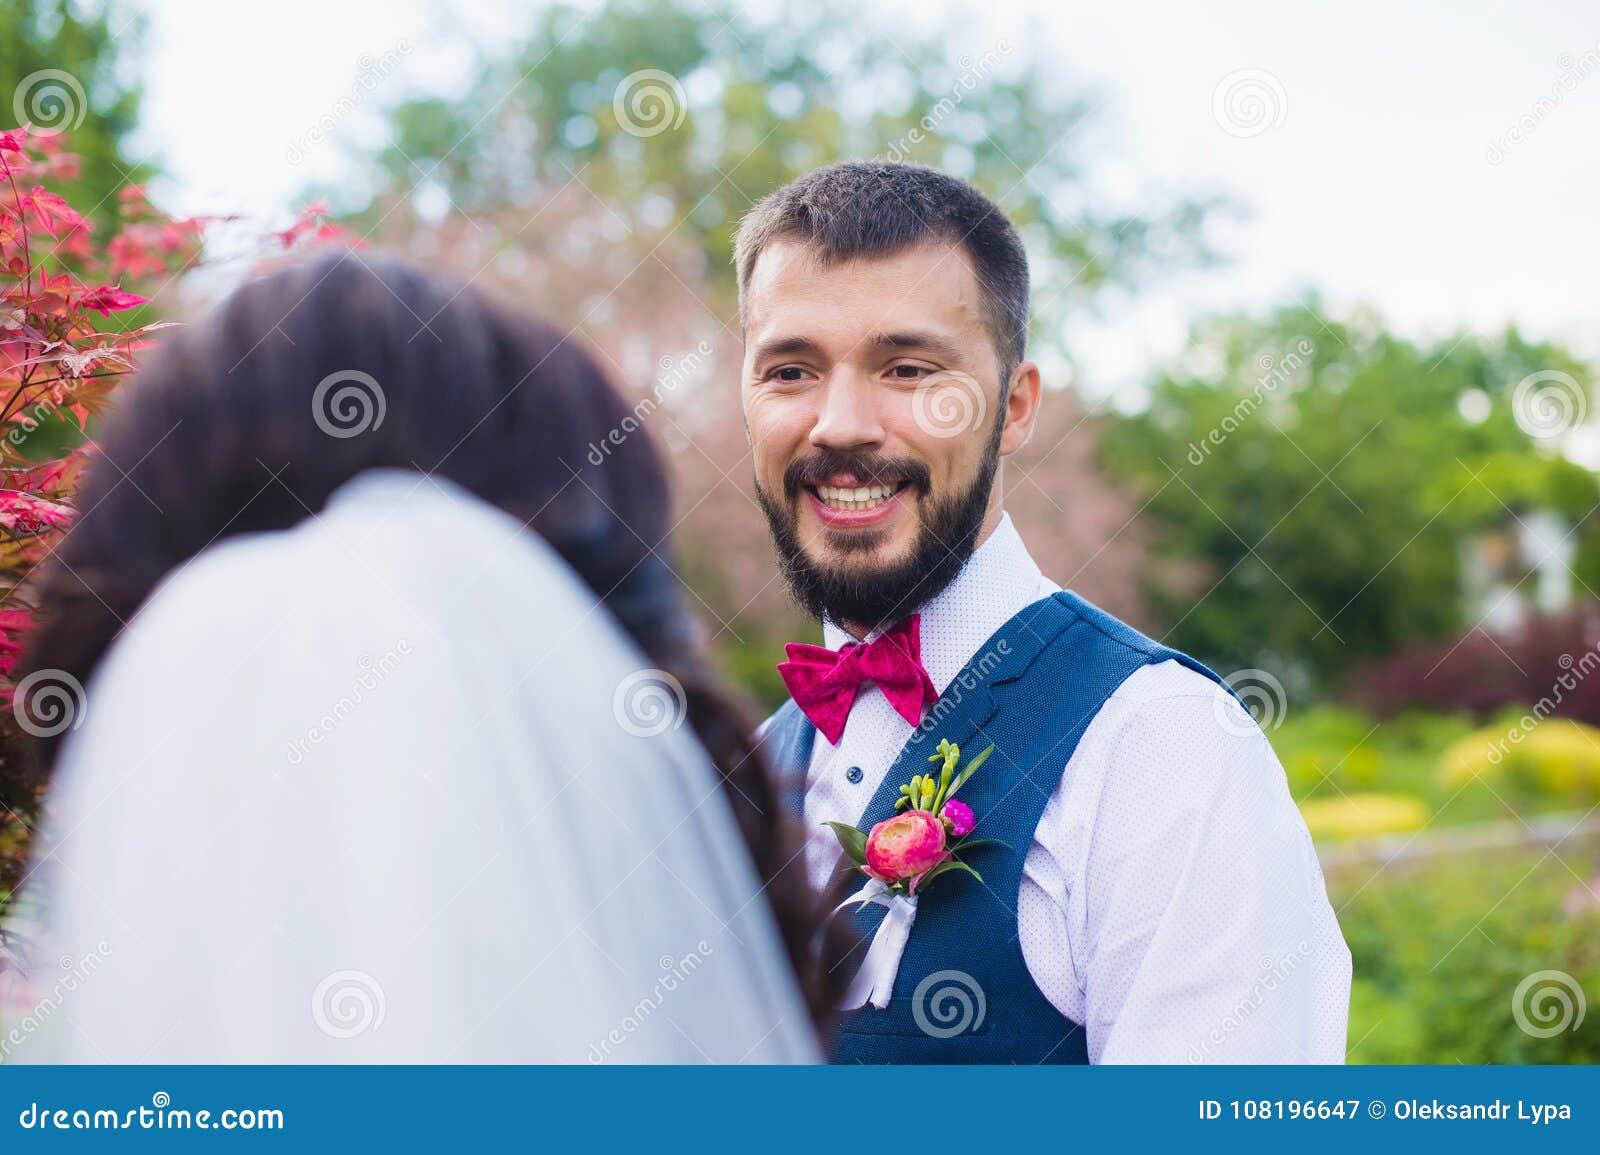 Portret van de knappe modieuze enkel gehuwde mens